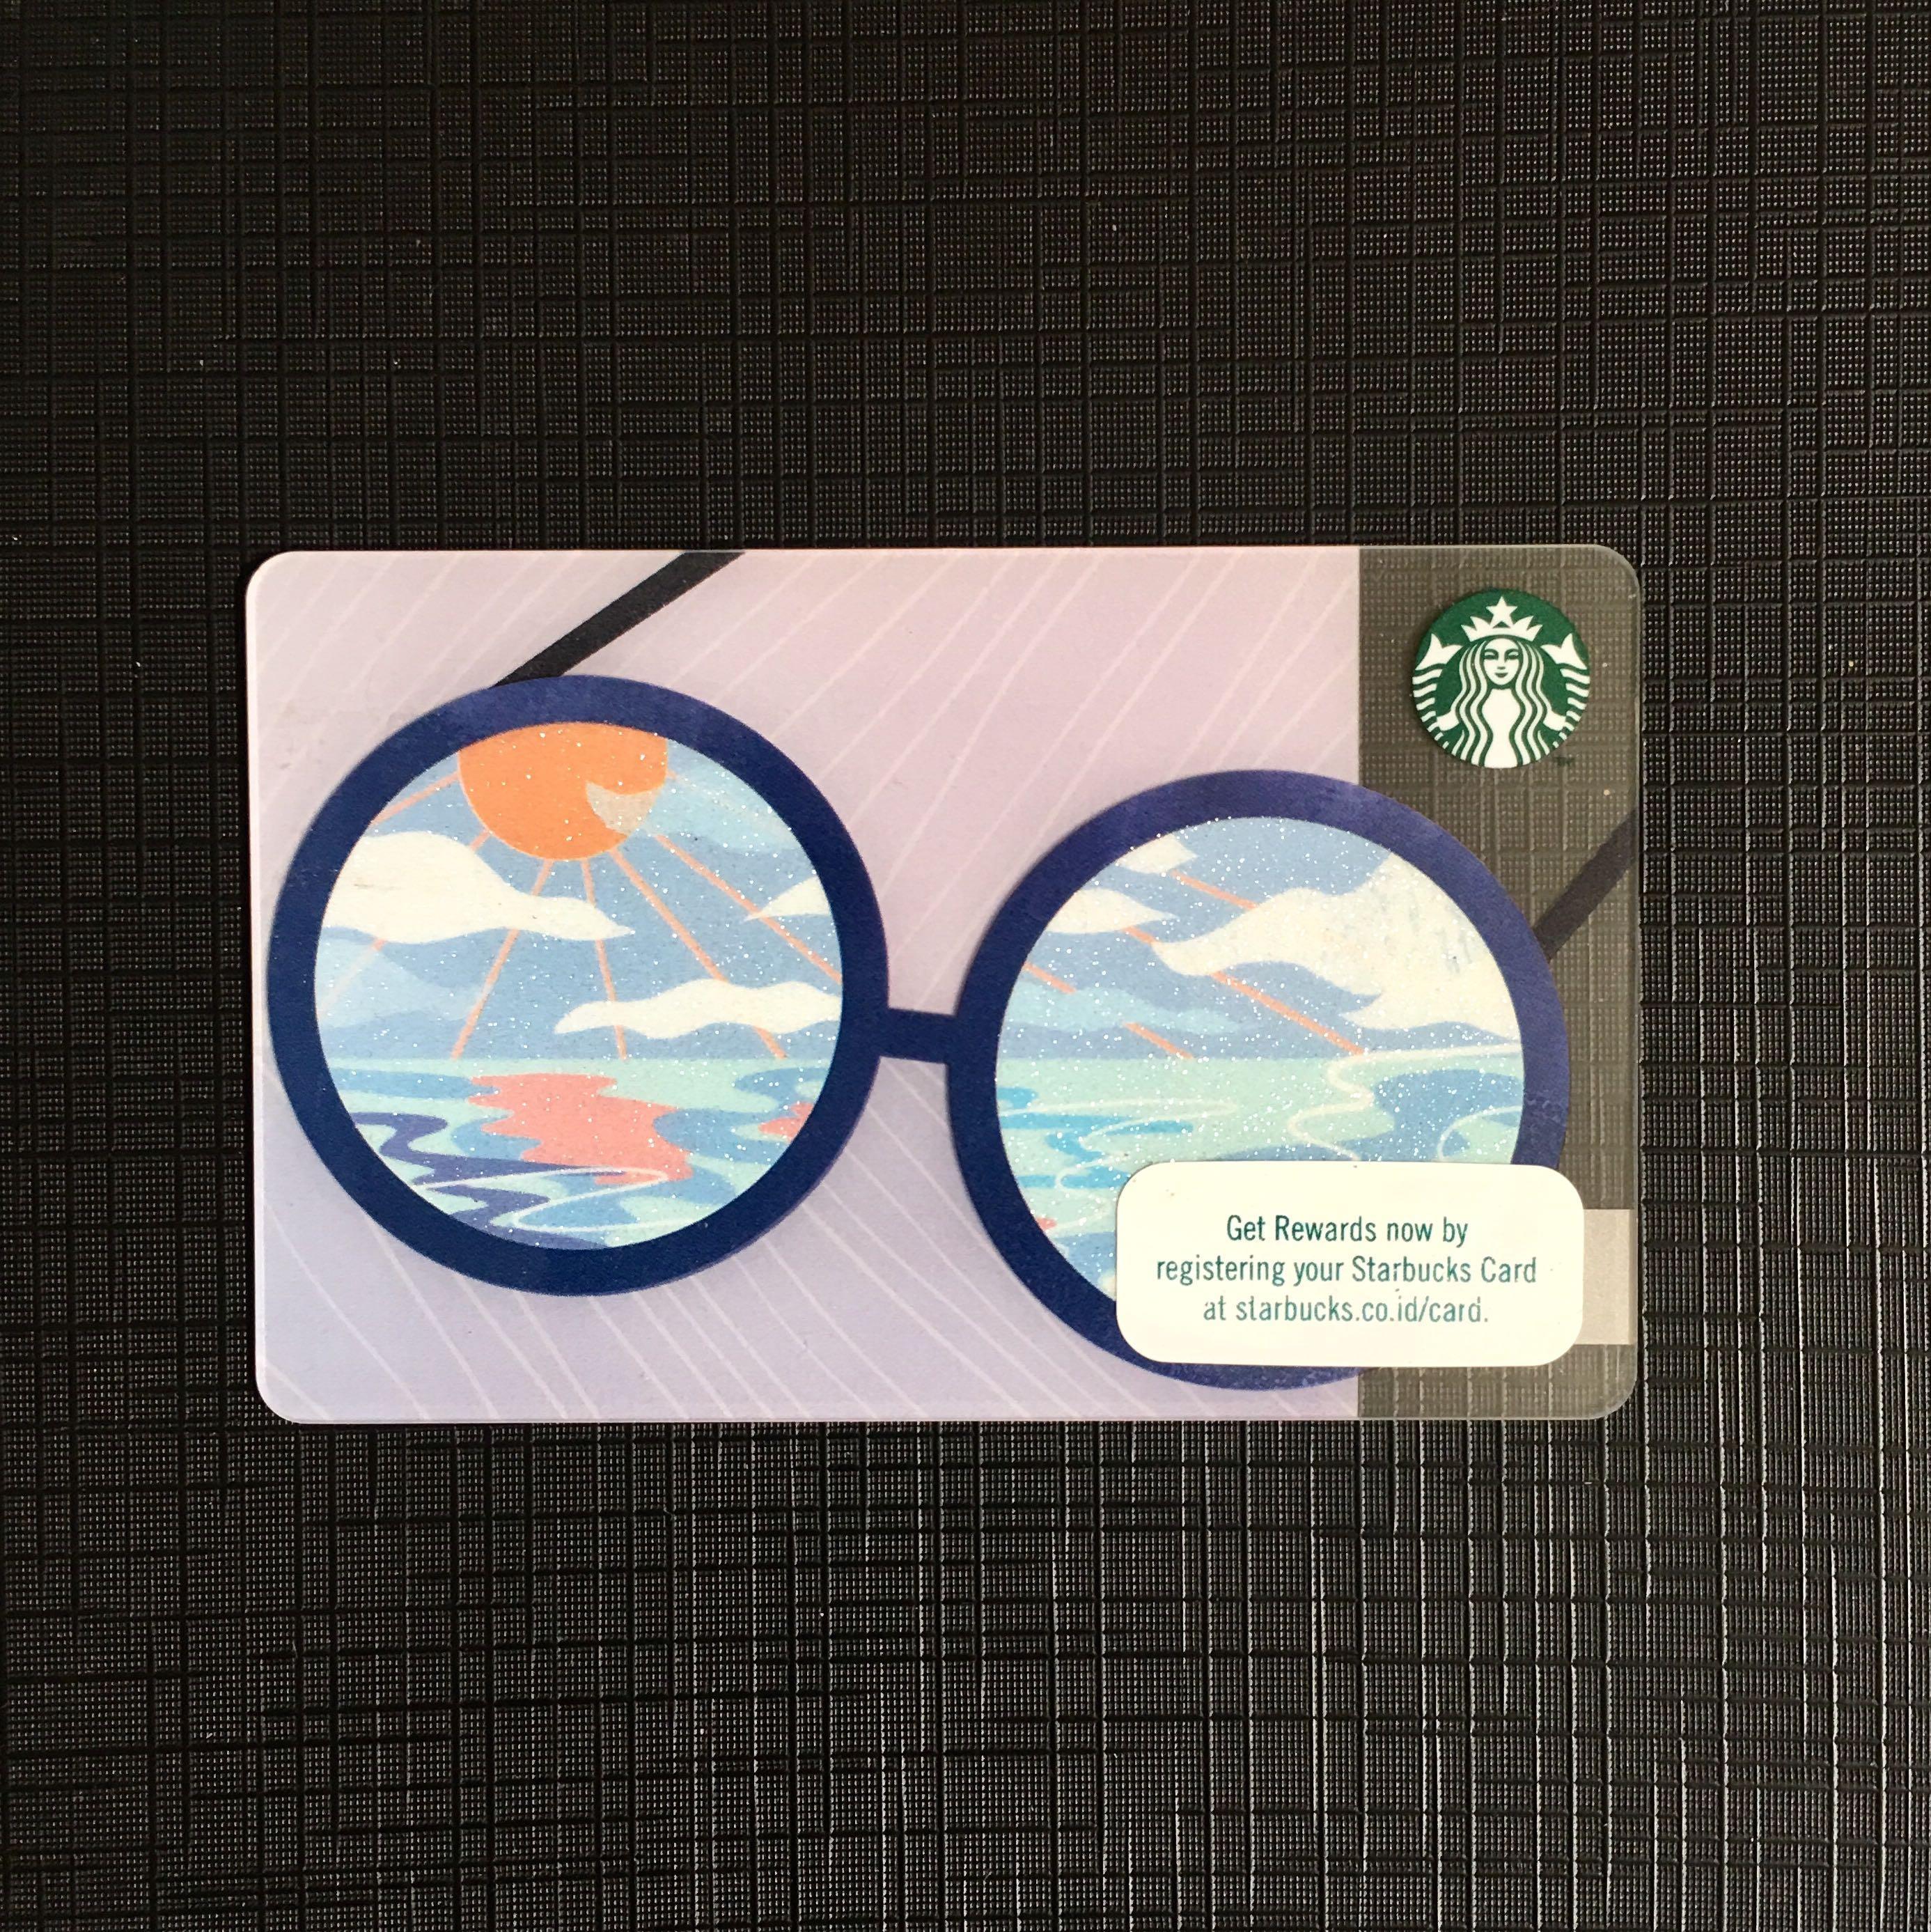 LIMITED EDITION STARBUCKS CARD SUMMER